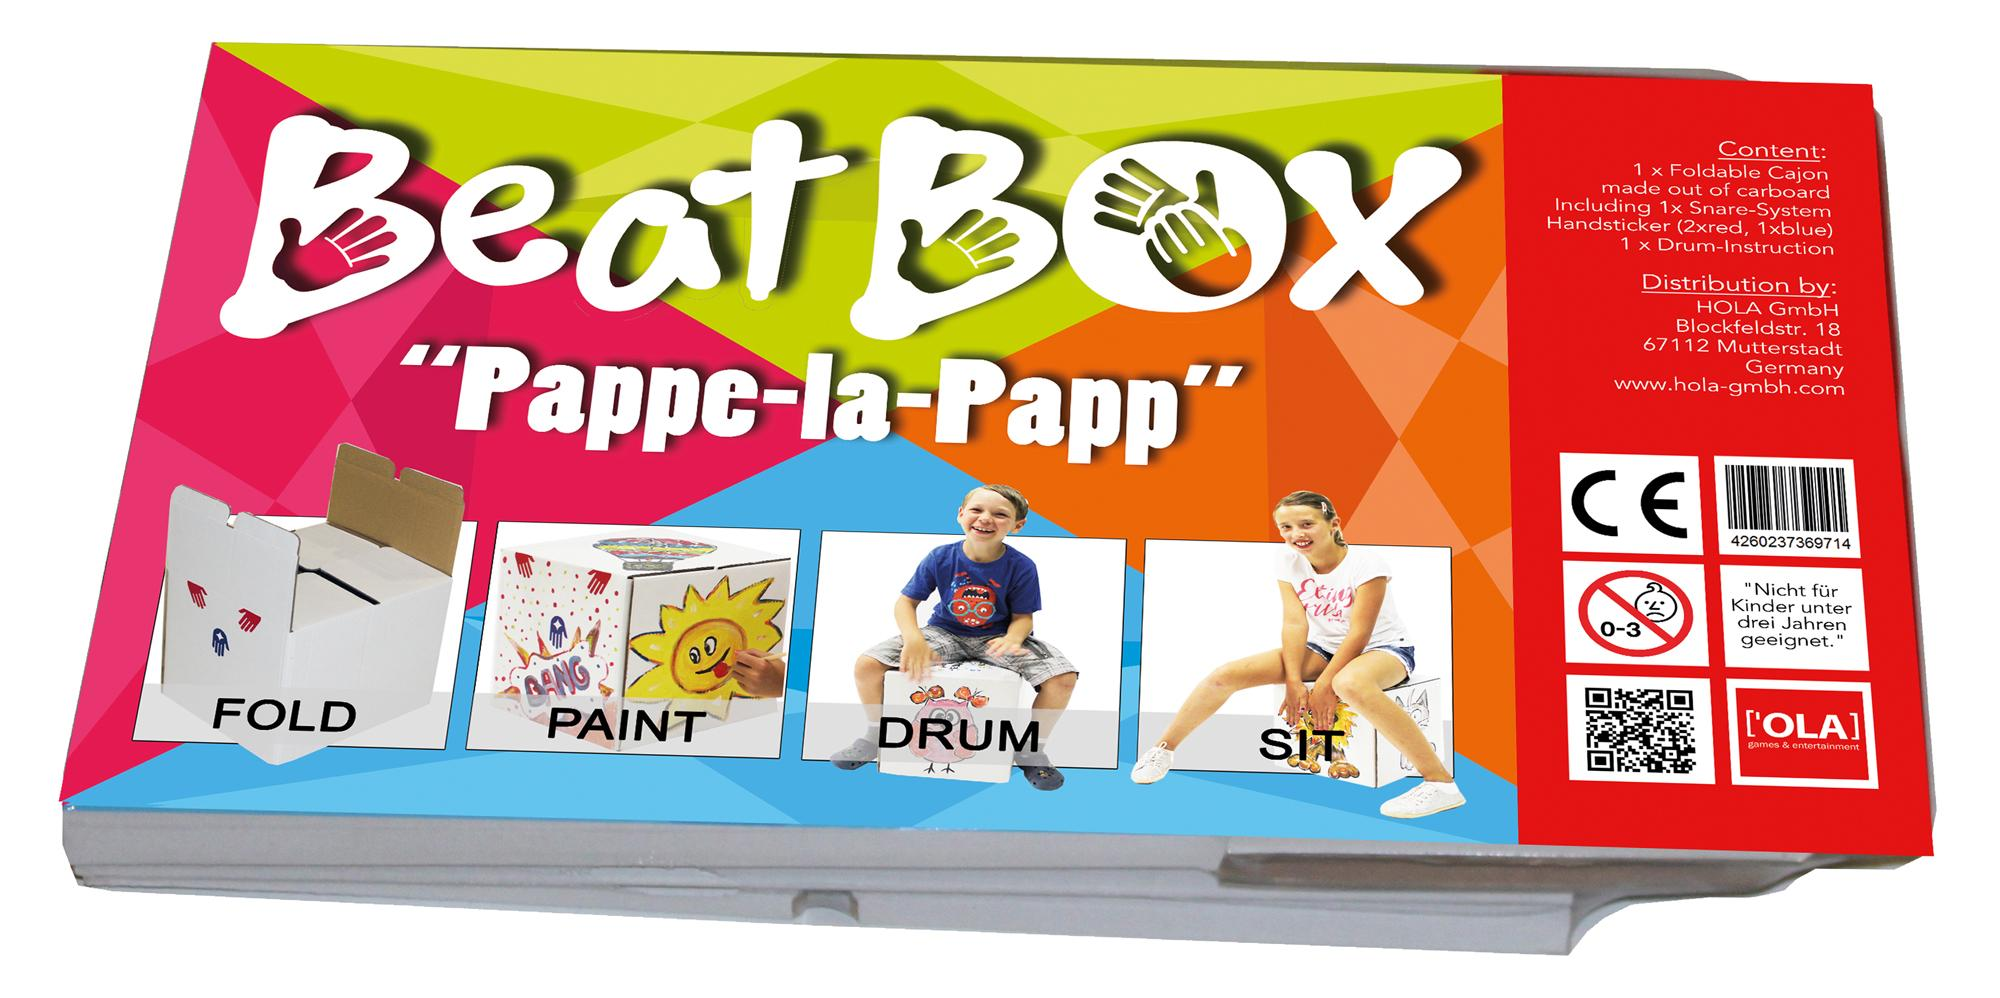 Baff Beatbox Pappe la Papp Cajon aus Karton